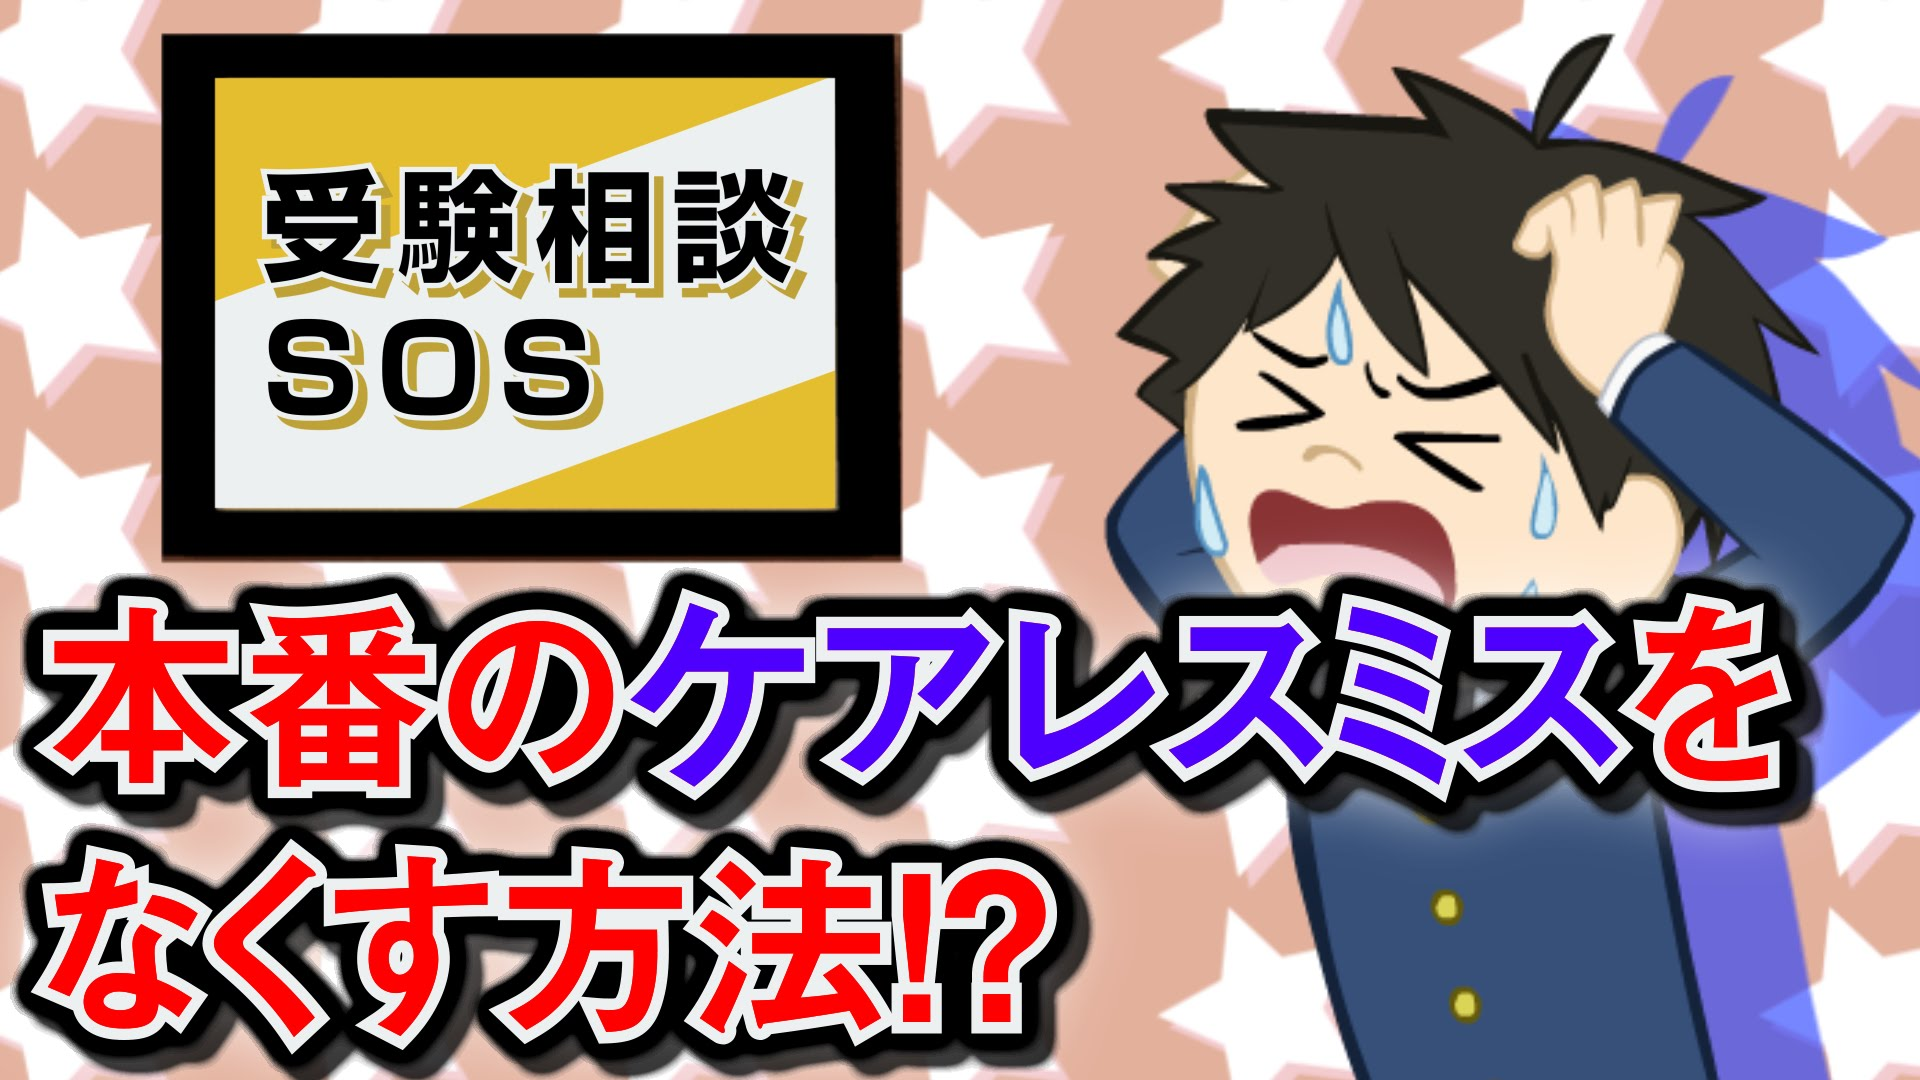 【vol.46】【センター直前スペシャル】試験でのケアレスミスを無くす方法!?|受験相談SOS